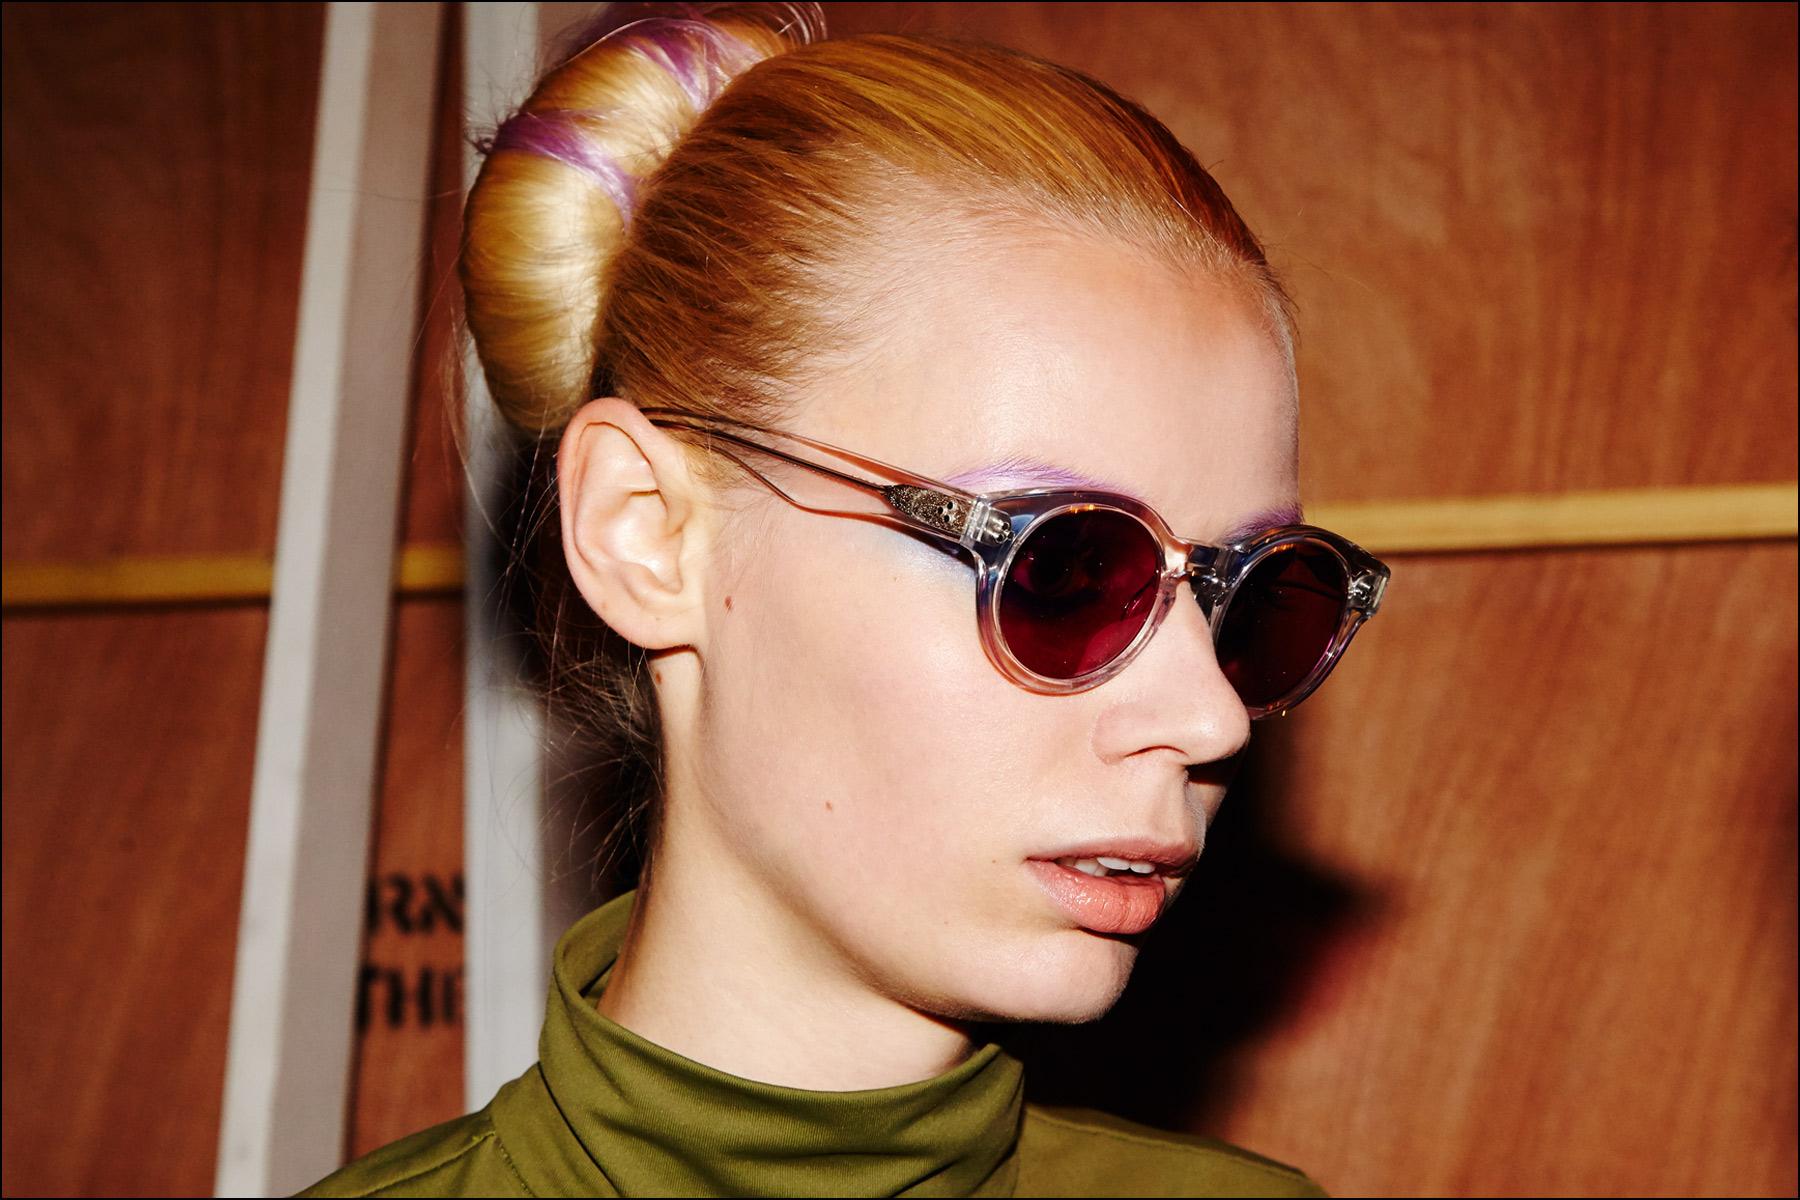 Backstage in sunglasses at Georgine